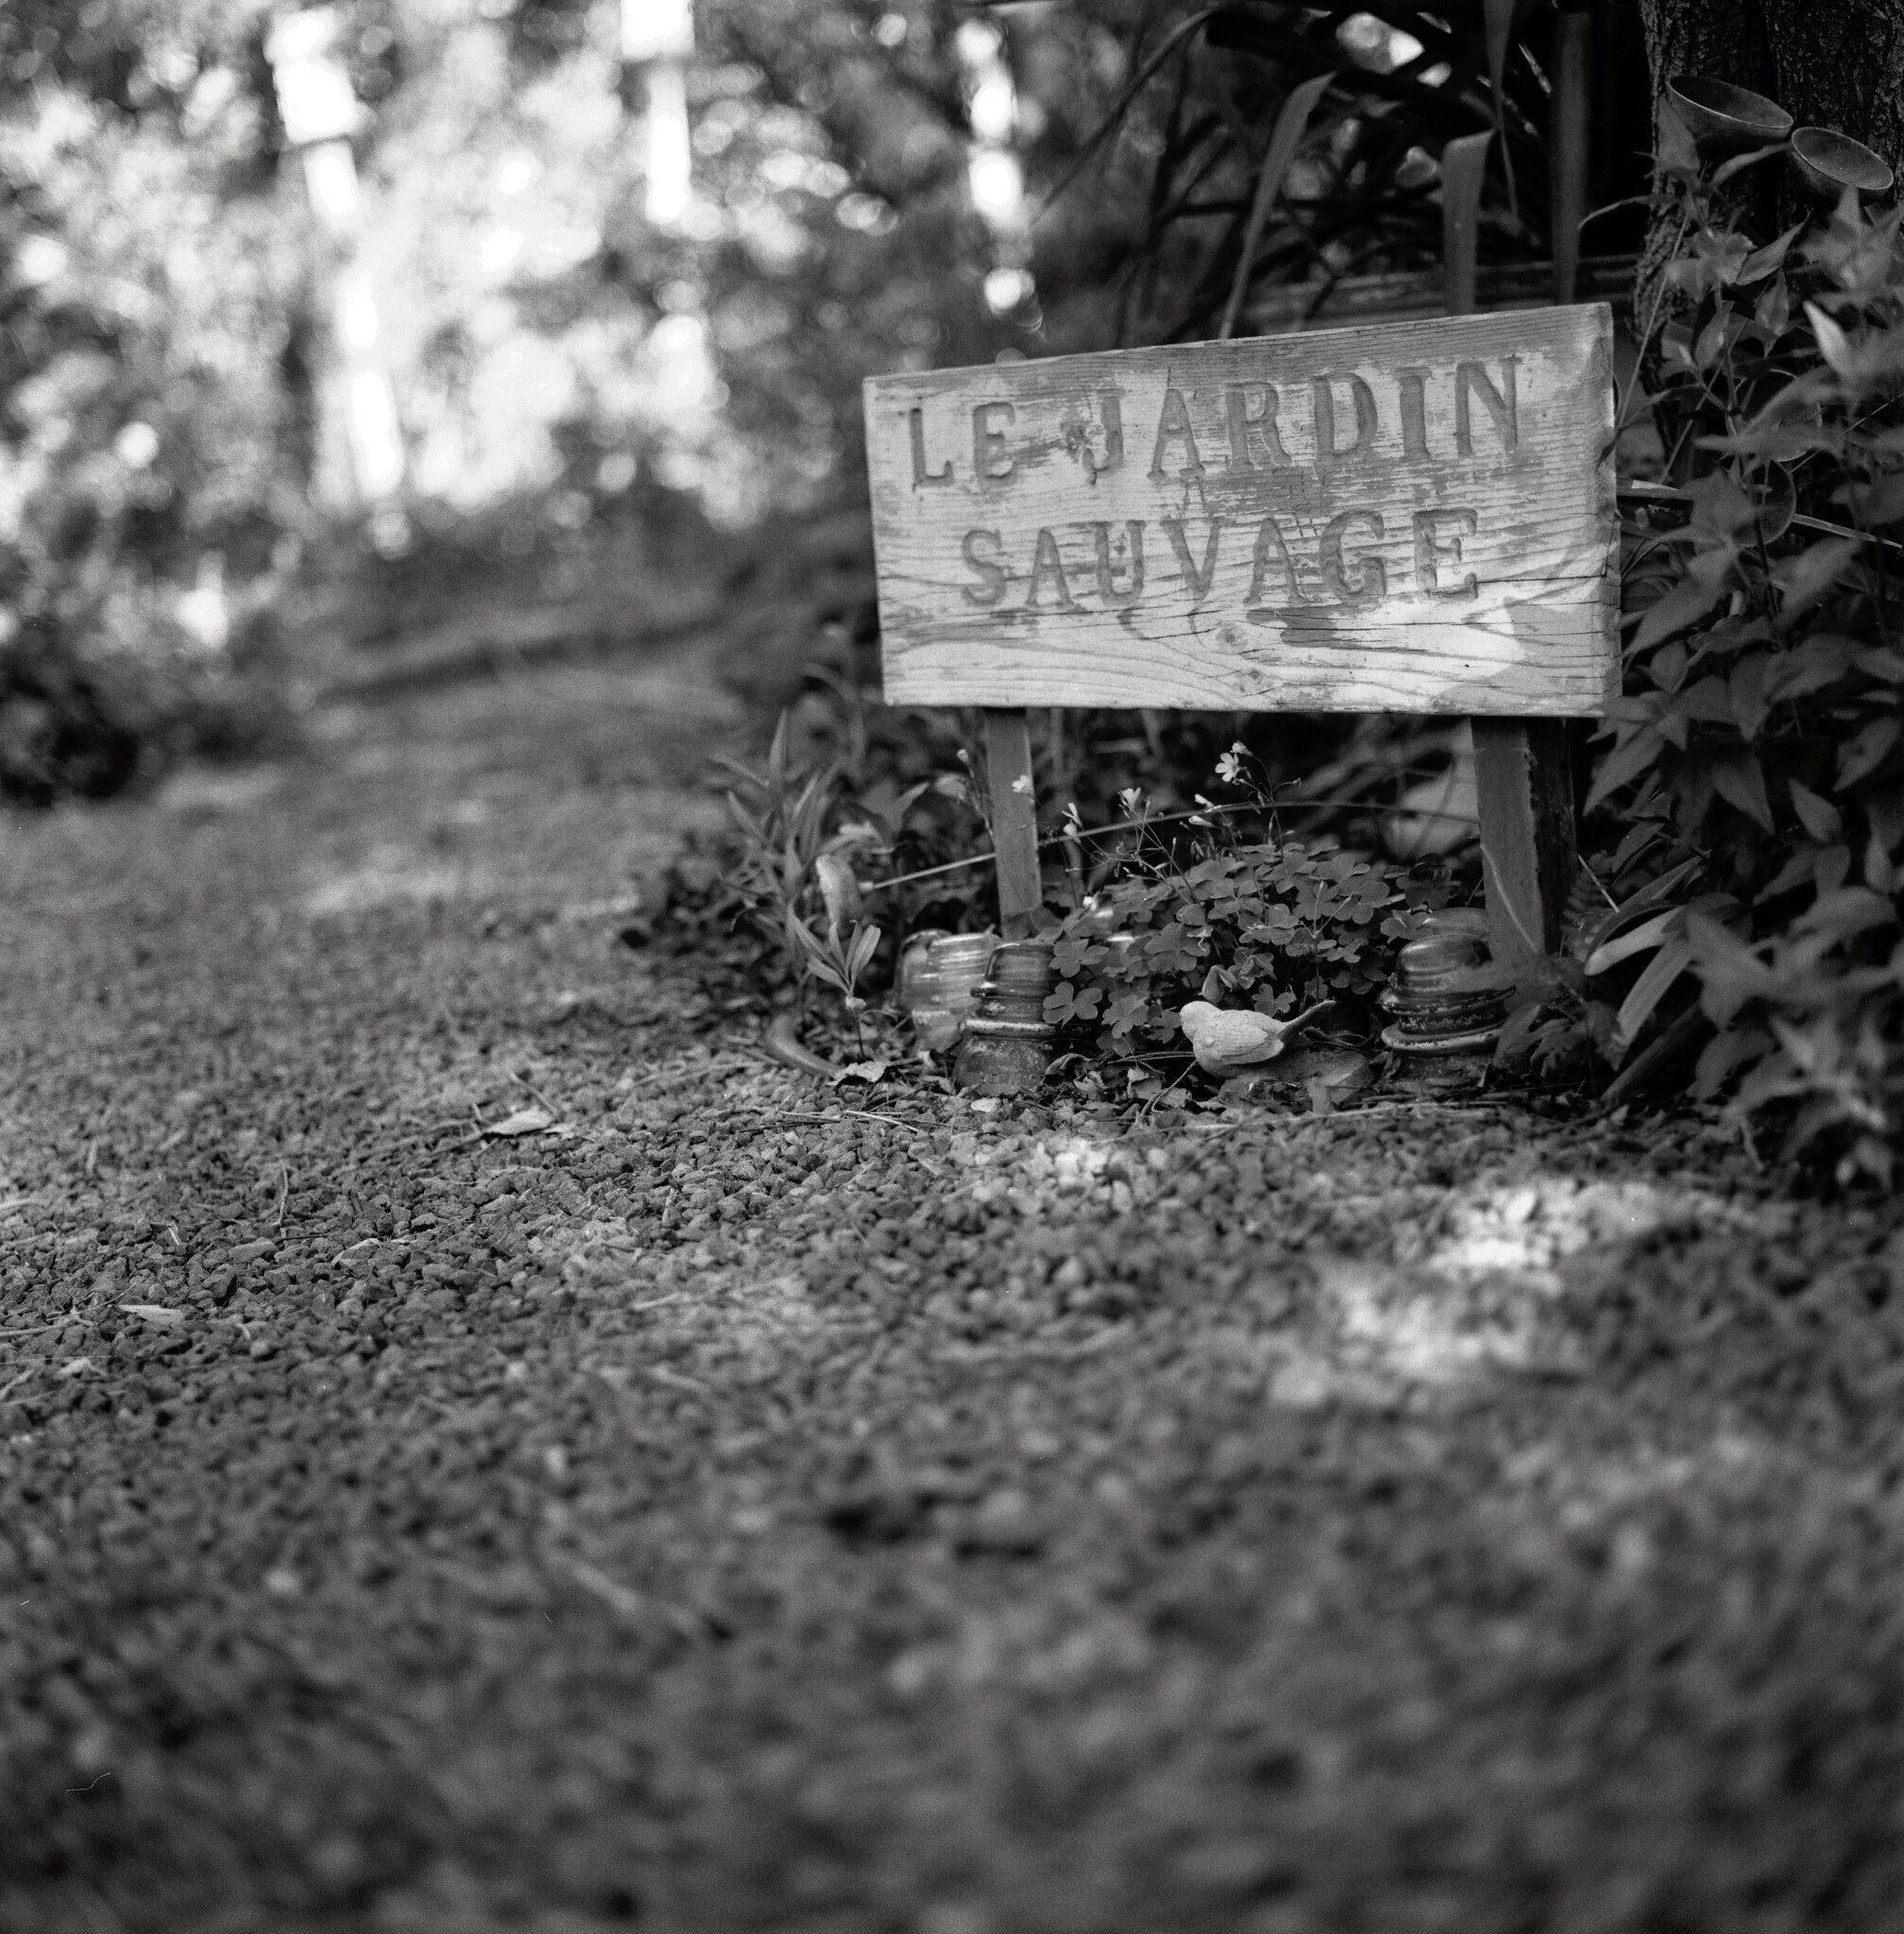 @Magooch3 · Oct 16 Replying to @ILFORDPhoto Pan F+ #depthoffield #fridayfavourites #ilfordphoto